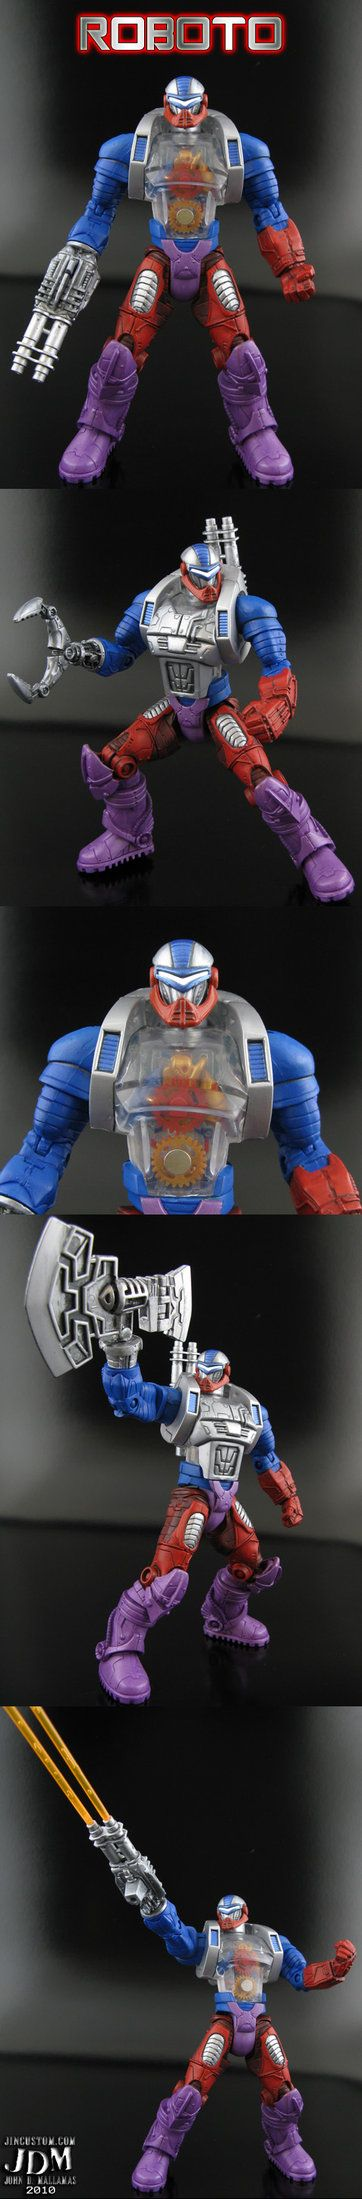 Domo arigato Mr Roboto by Jin-Saotome